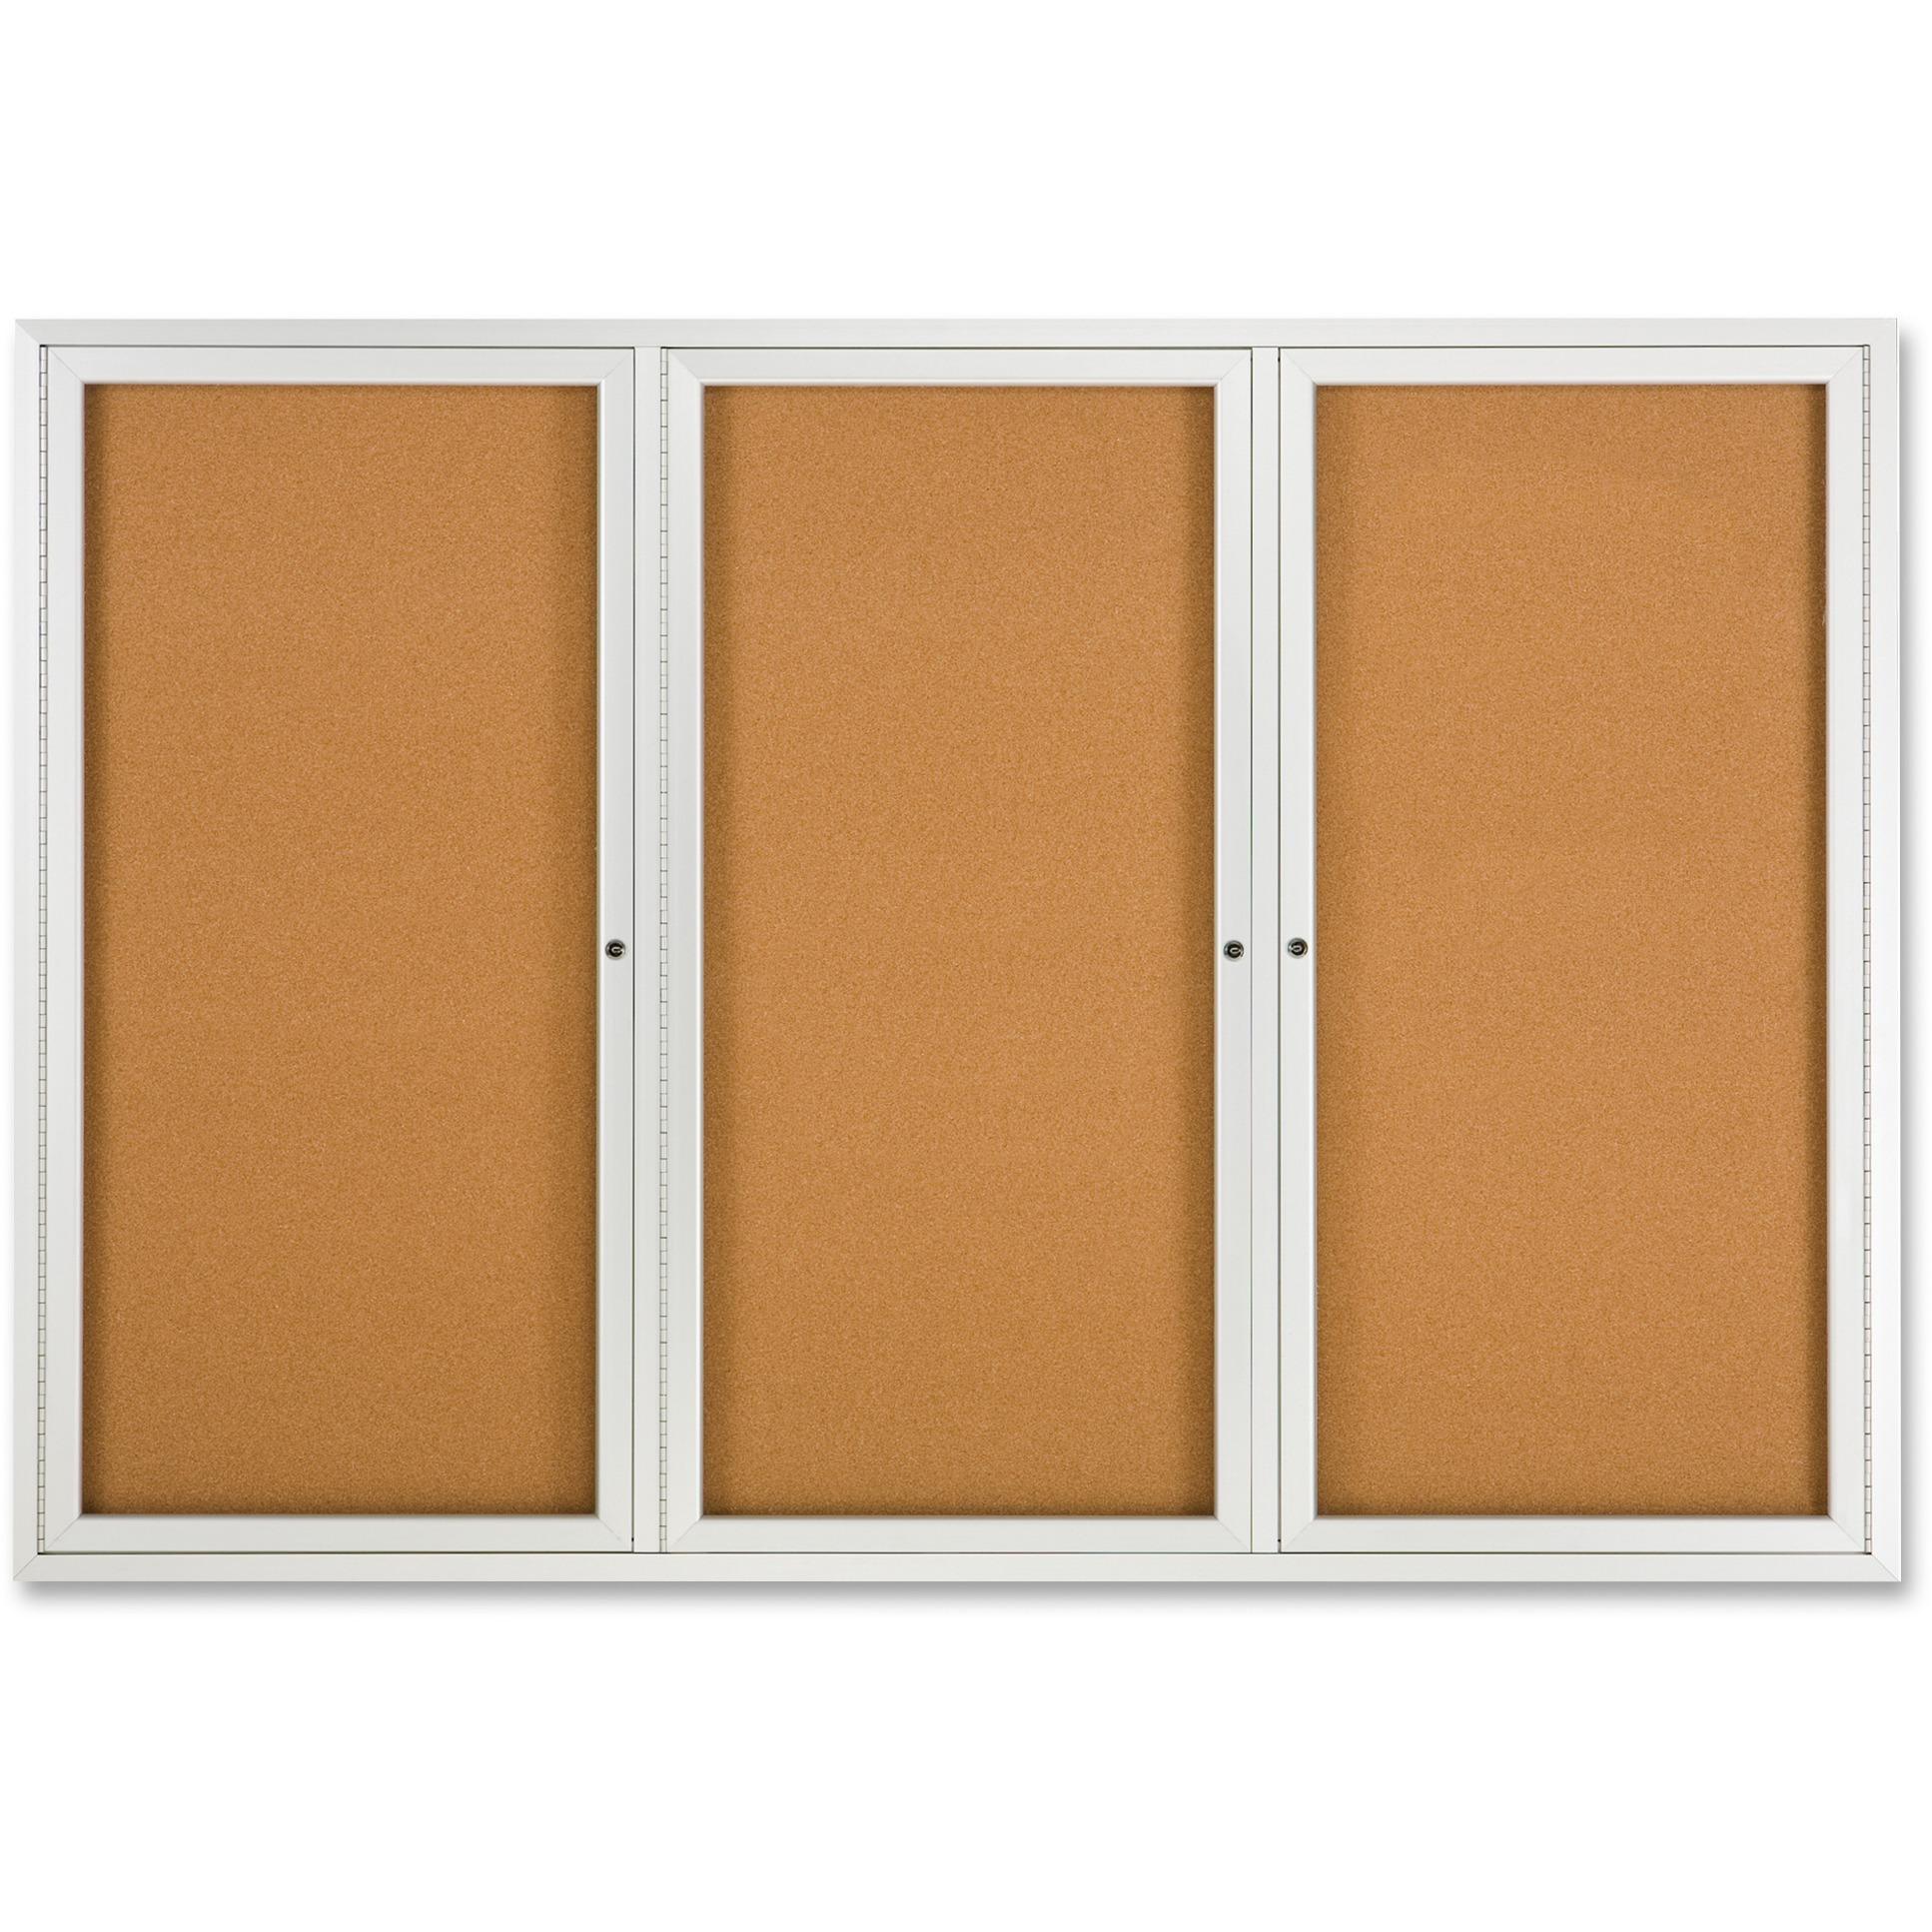 Quartet, QRT2367, Framed 3-door Enclosed Cork Bulletin Brd, 1 Each